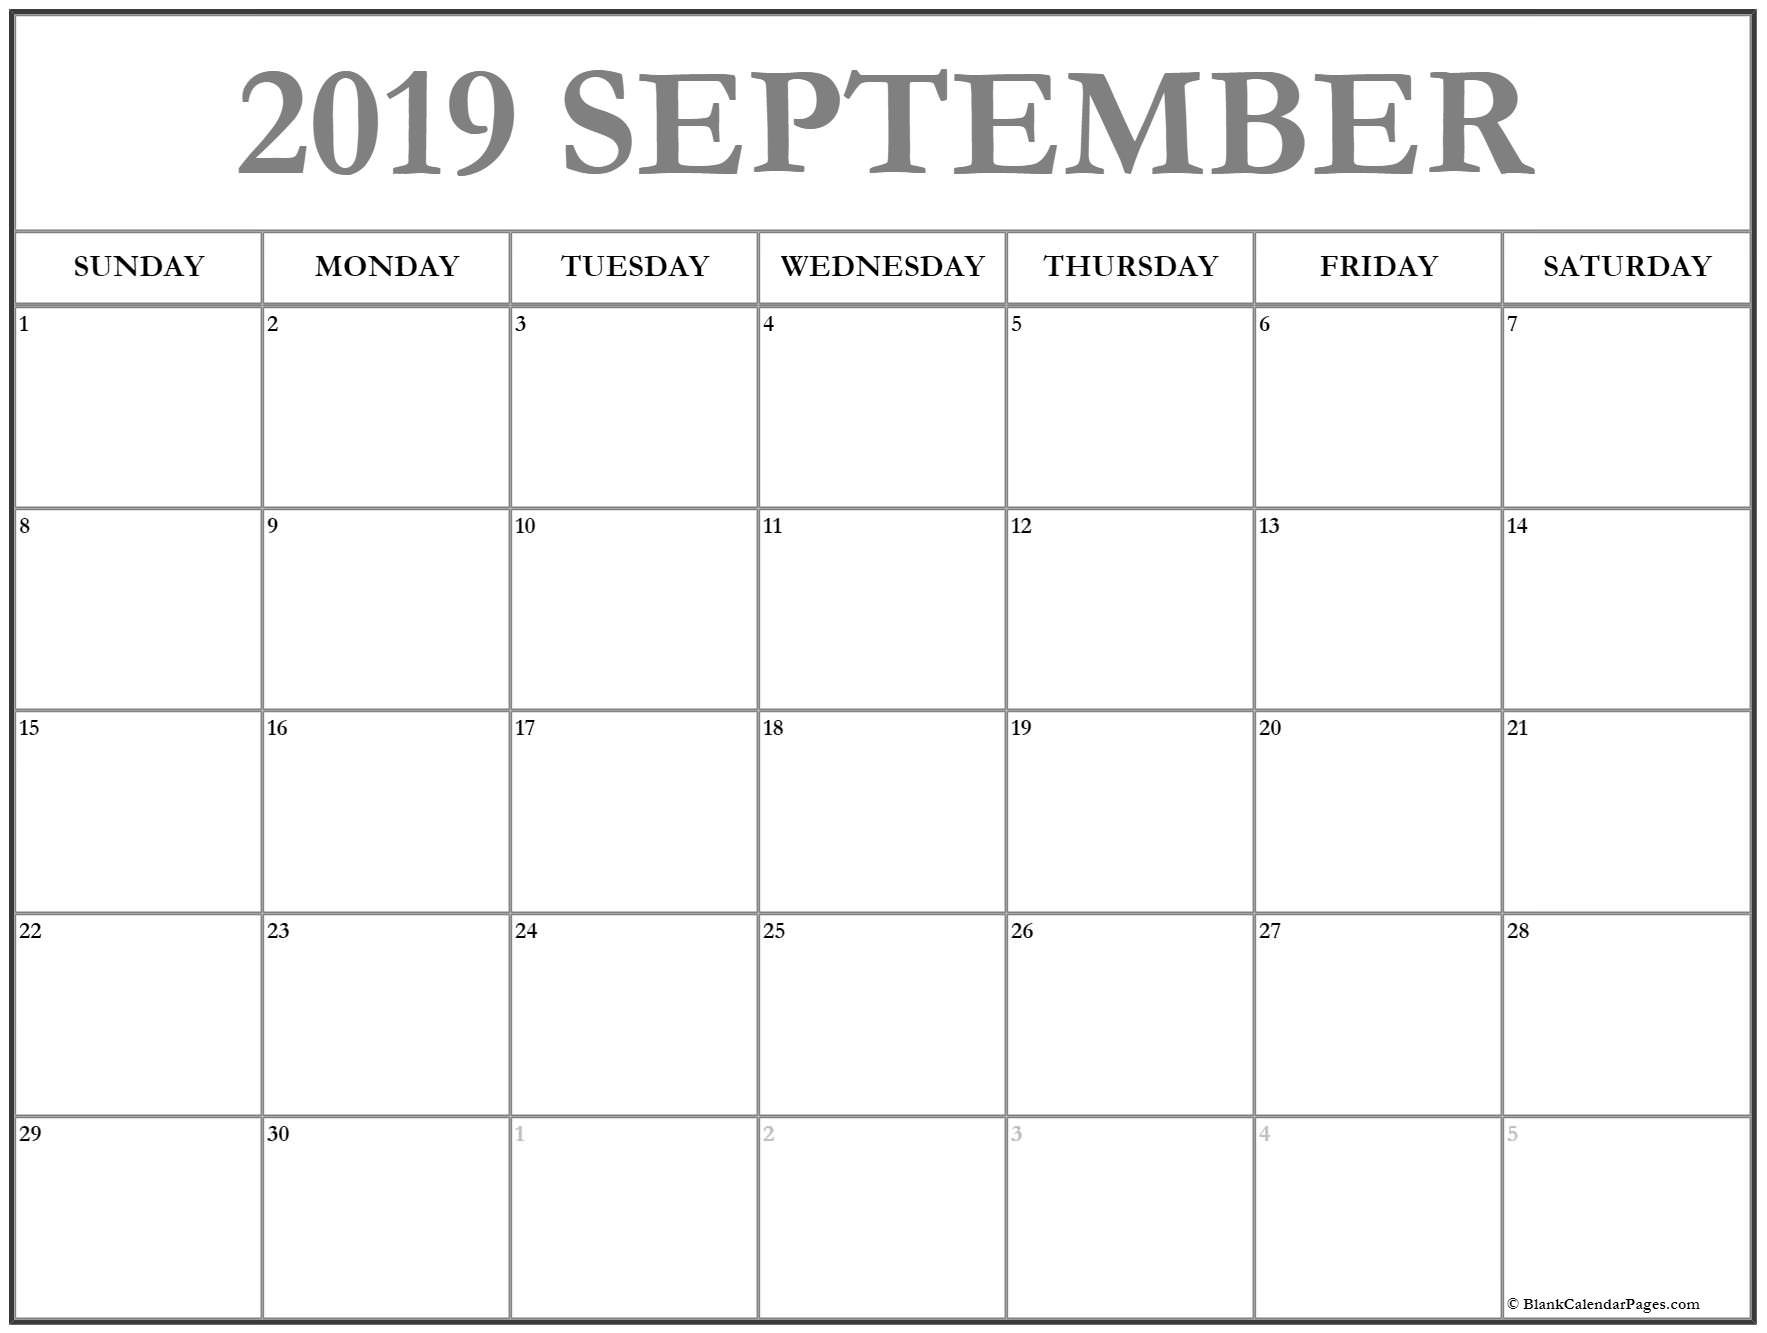 September 2019 Calendar   56+ Templates Of 2019 Printable Calendars Calendar 2019 Sept